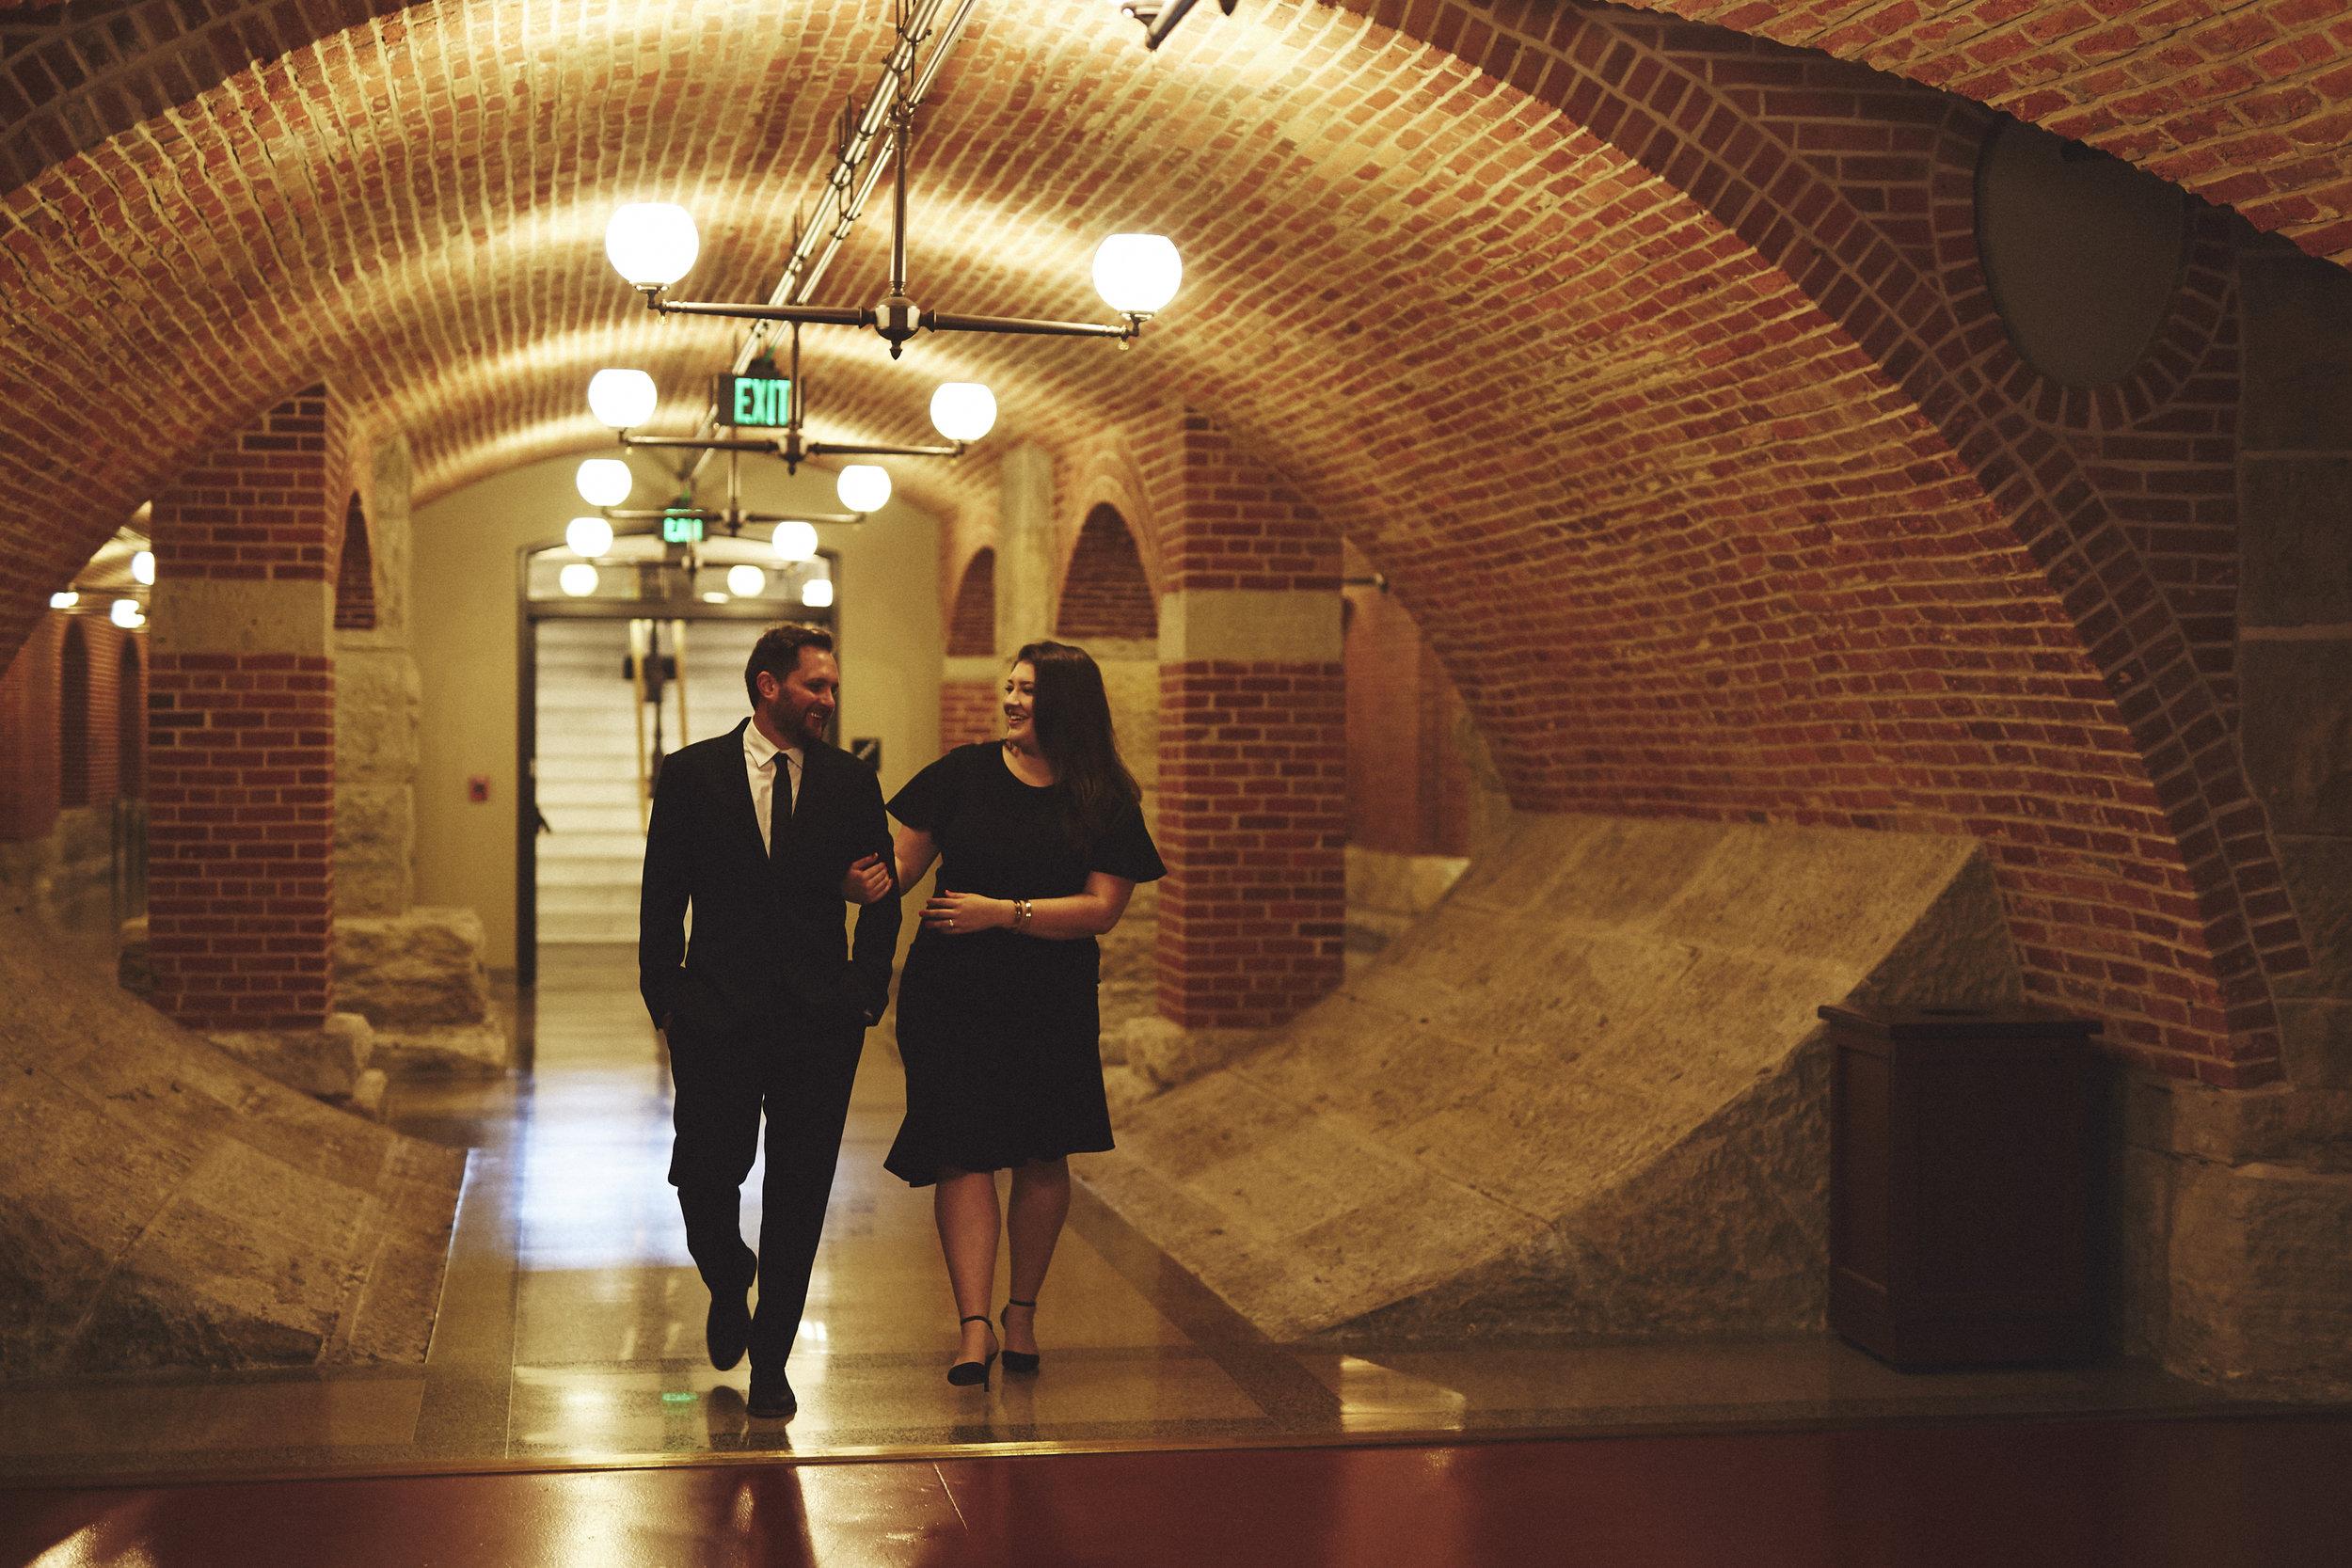 Rachel & Stephen - benromangphoto - 6I5A3279.jpg